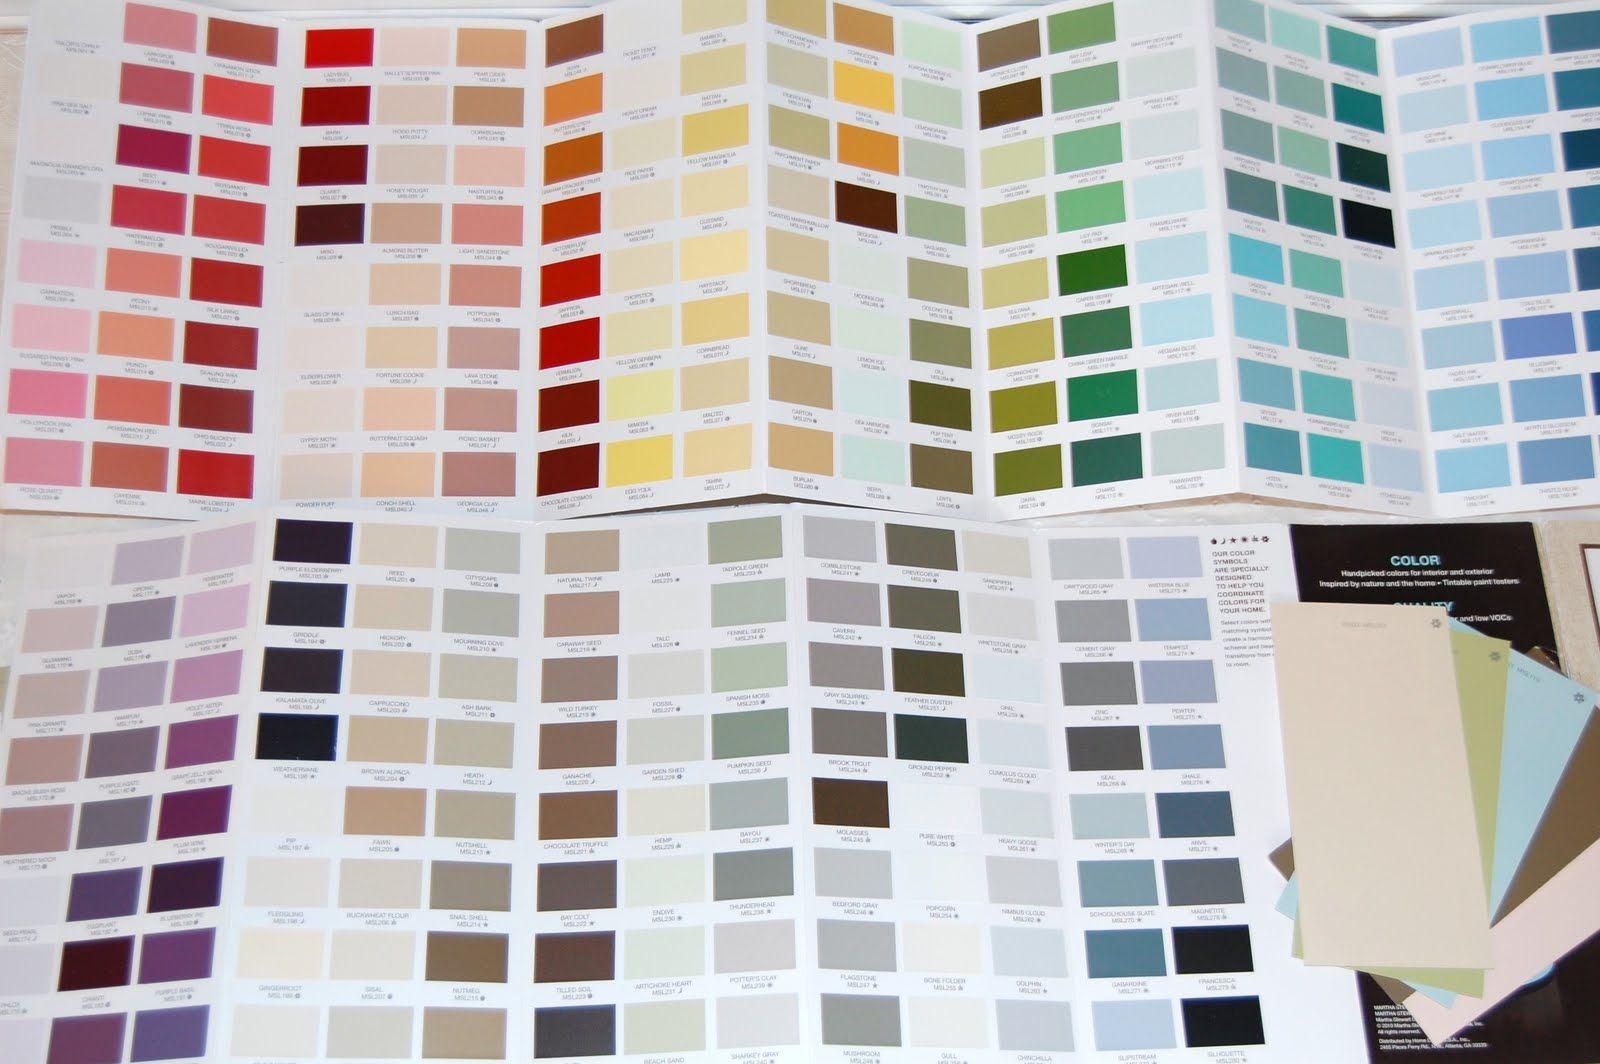 martha stewart paint color chart 2019 paint color chart on home depot exterior paint colors id=19305